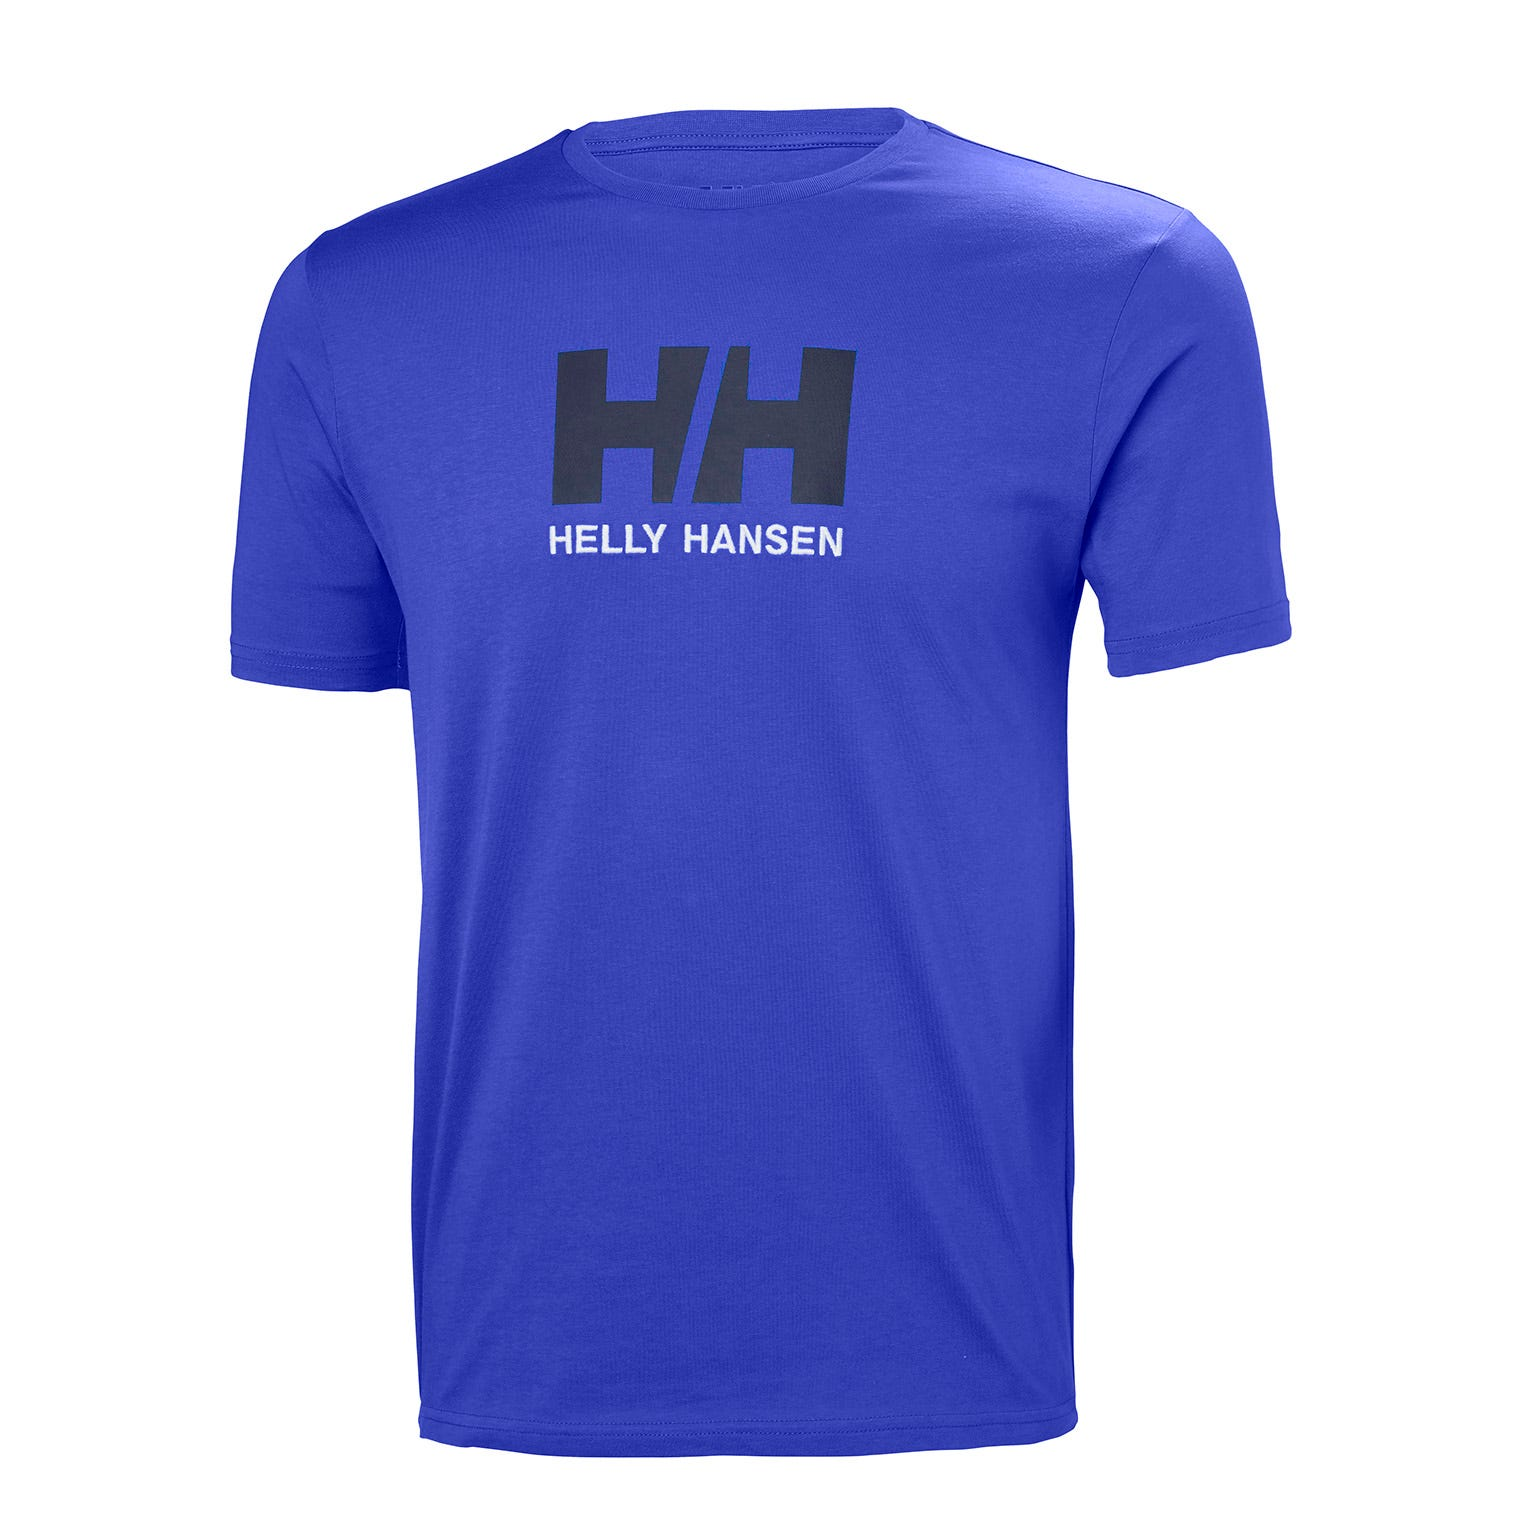 Helly Hansen Mens Hh Logo Tshirt Blue Xxl